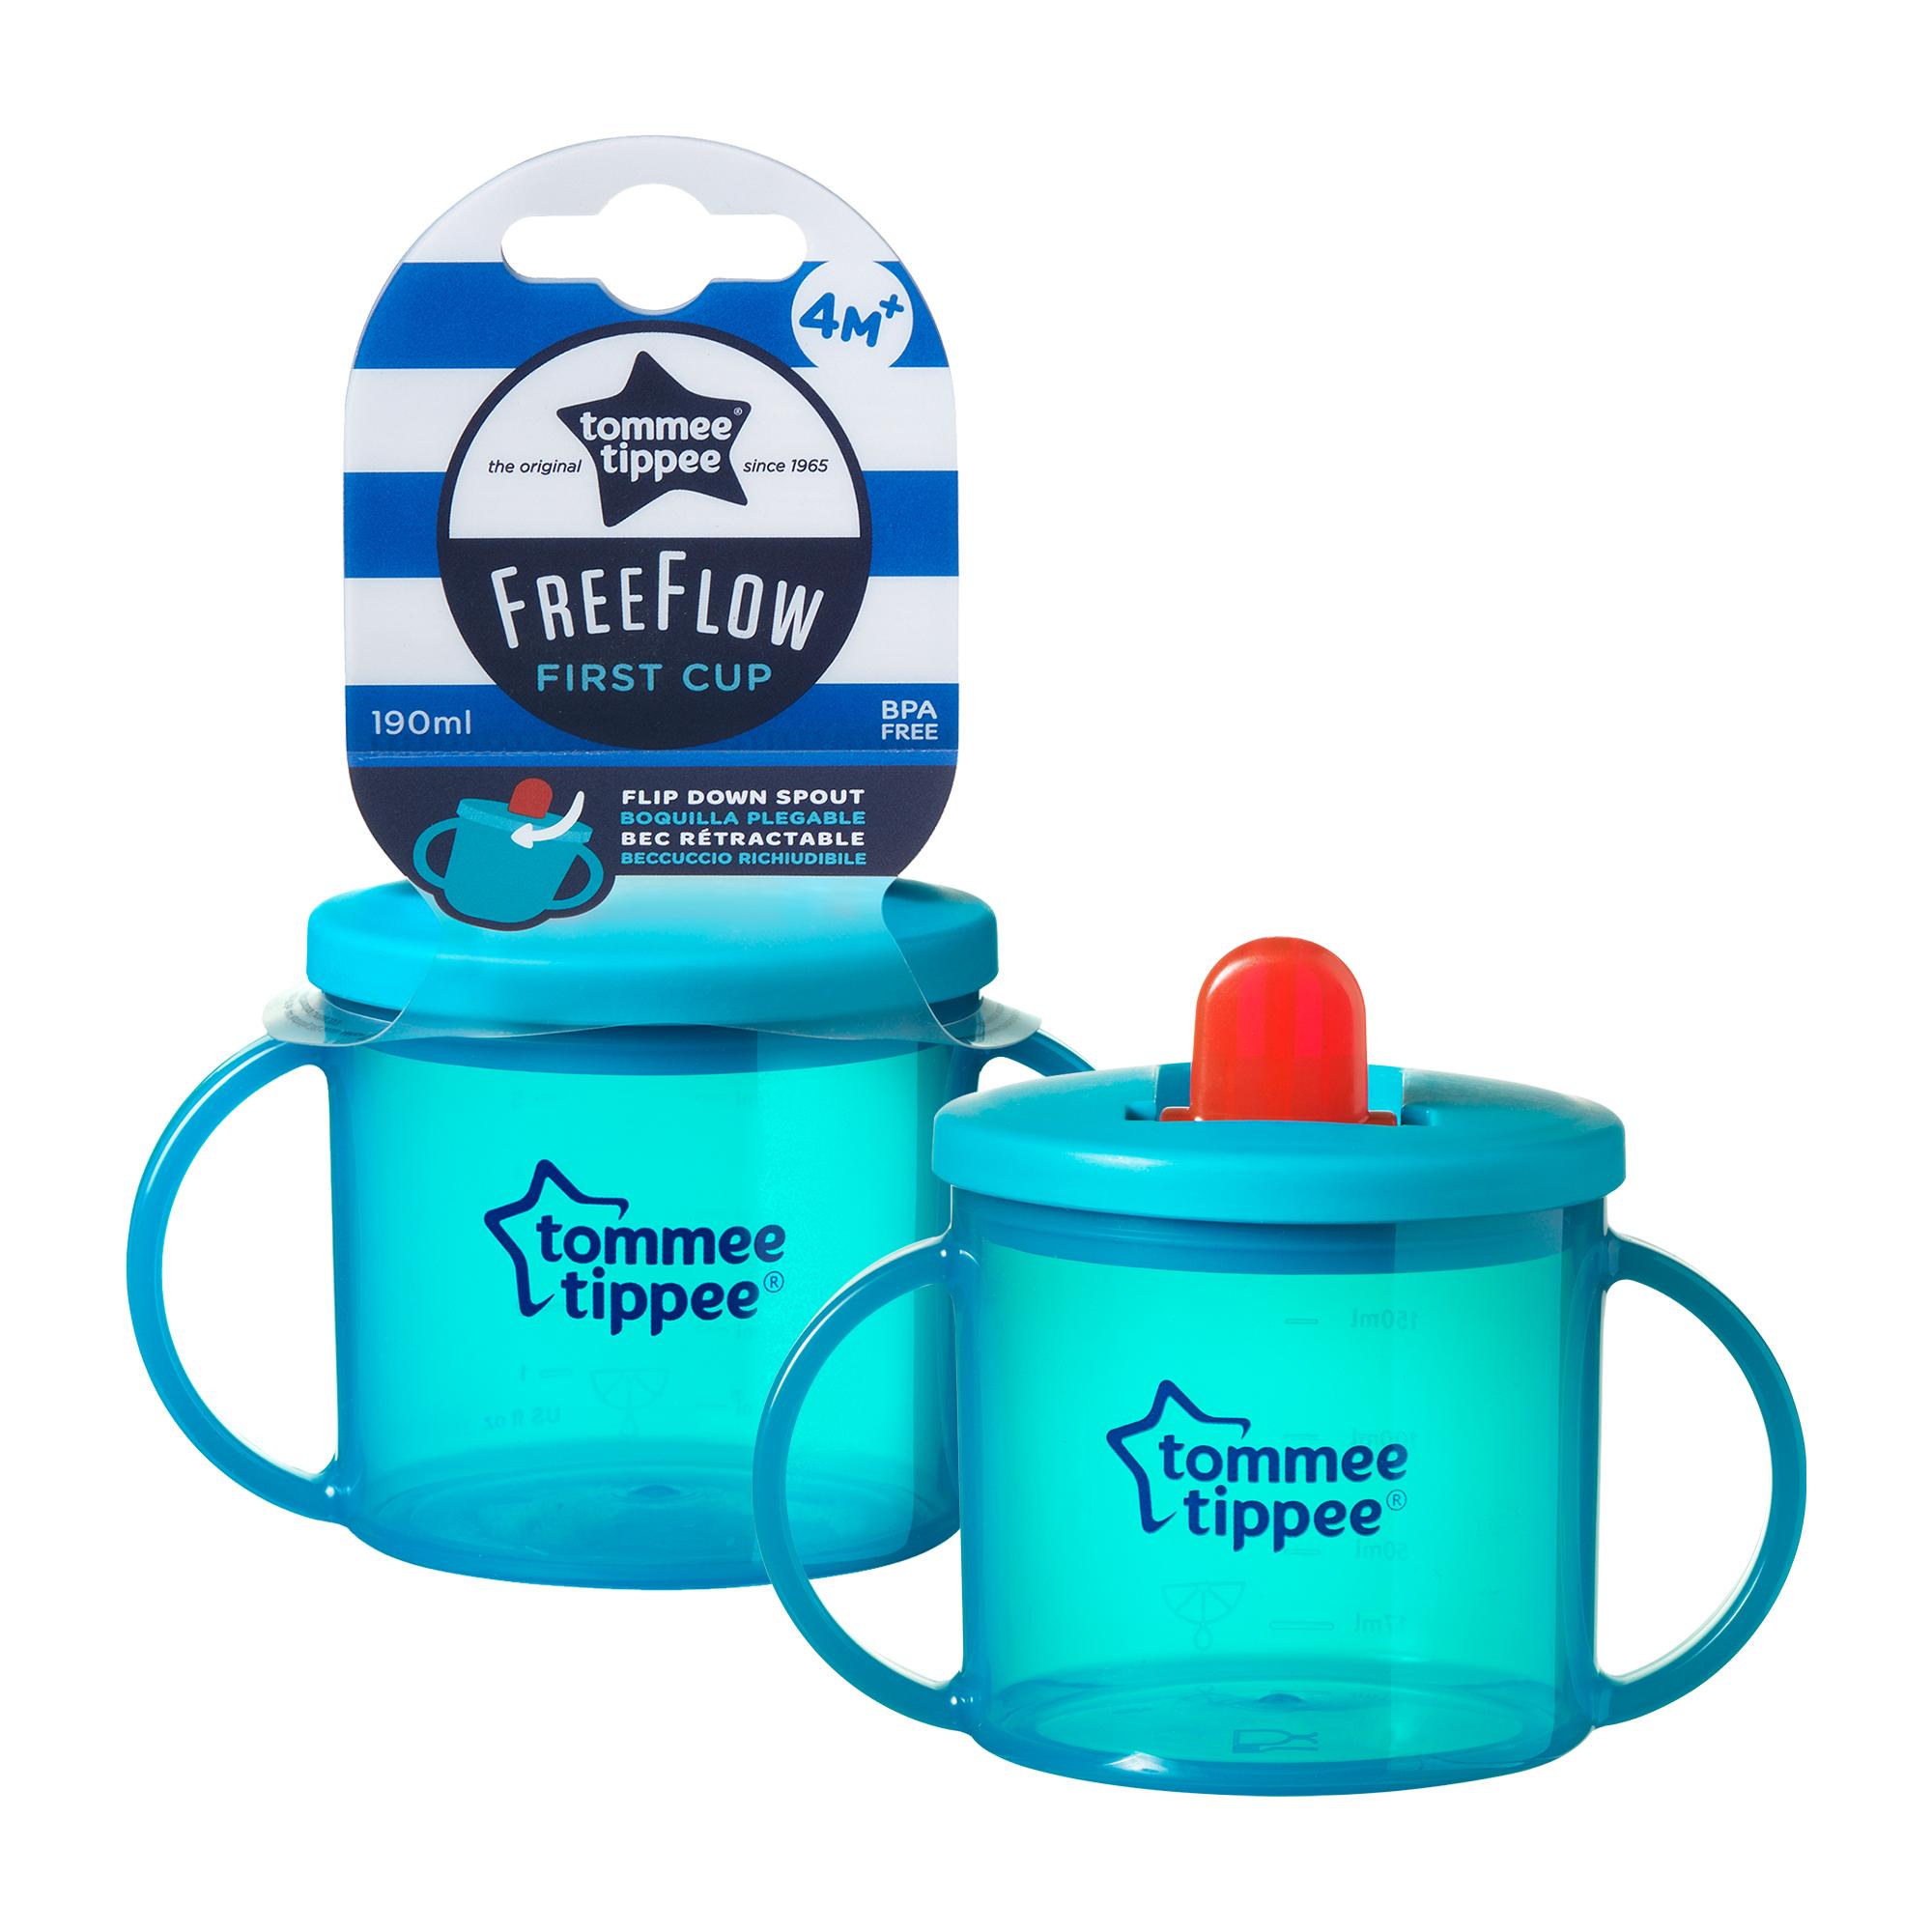 Basics Cana First Cup, Tommee Tippee, gradata, 190ml, Albastru